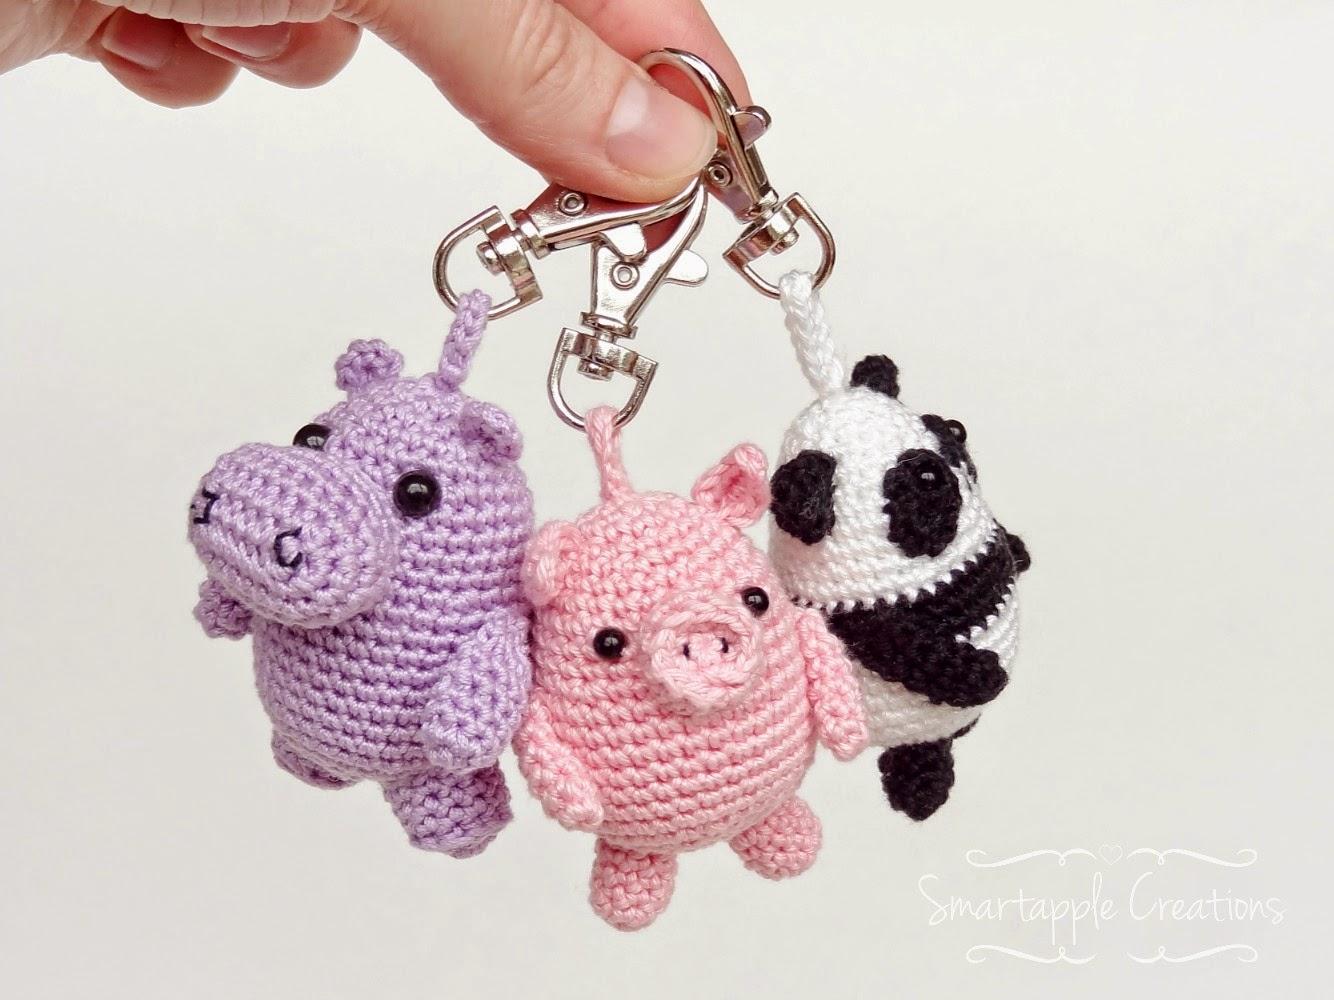 Smartapple Creations Amigurumi And Crochet Amigurumi